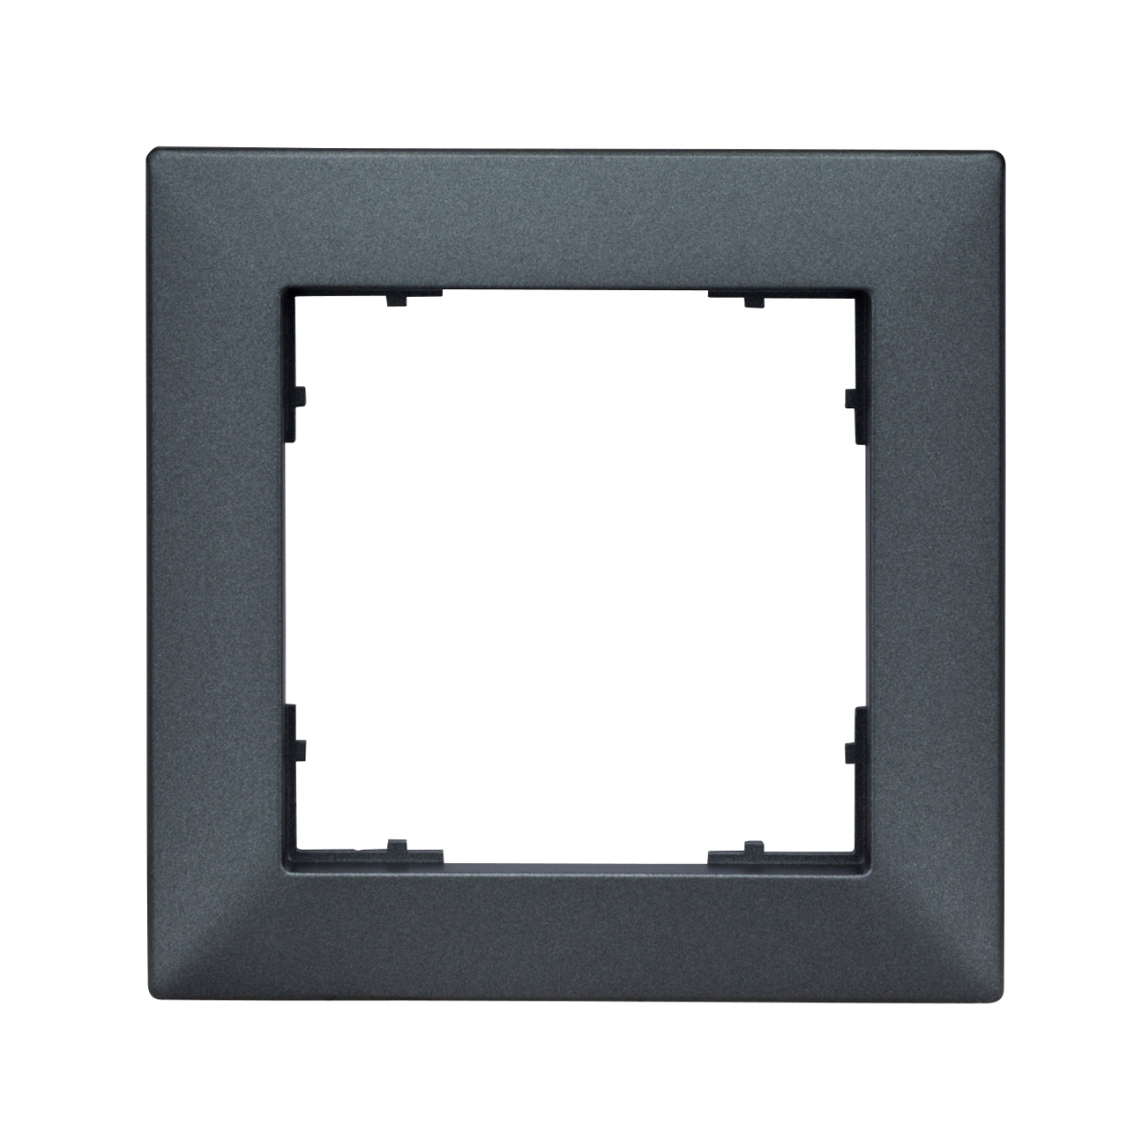 1 Stk Rahmen 55x55mm, 1-fach, anthrazit EV115021--